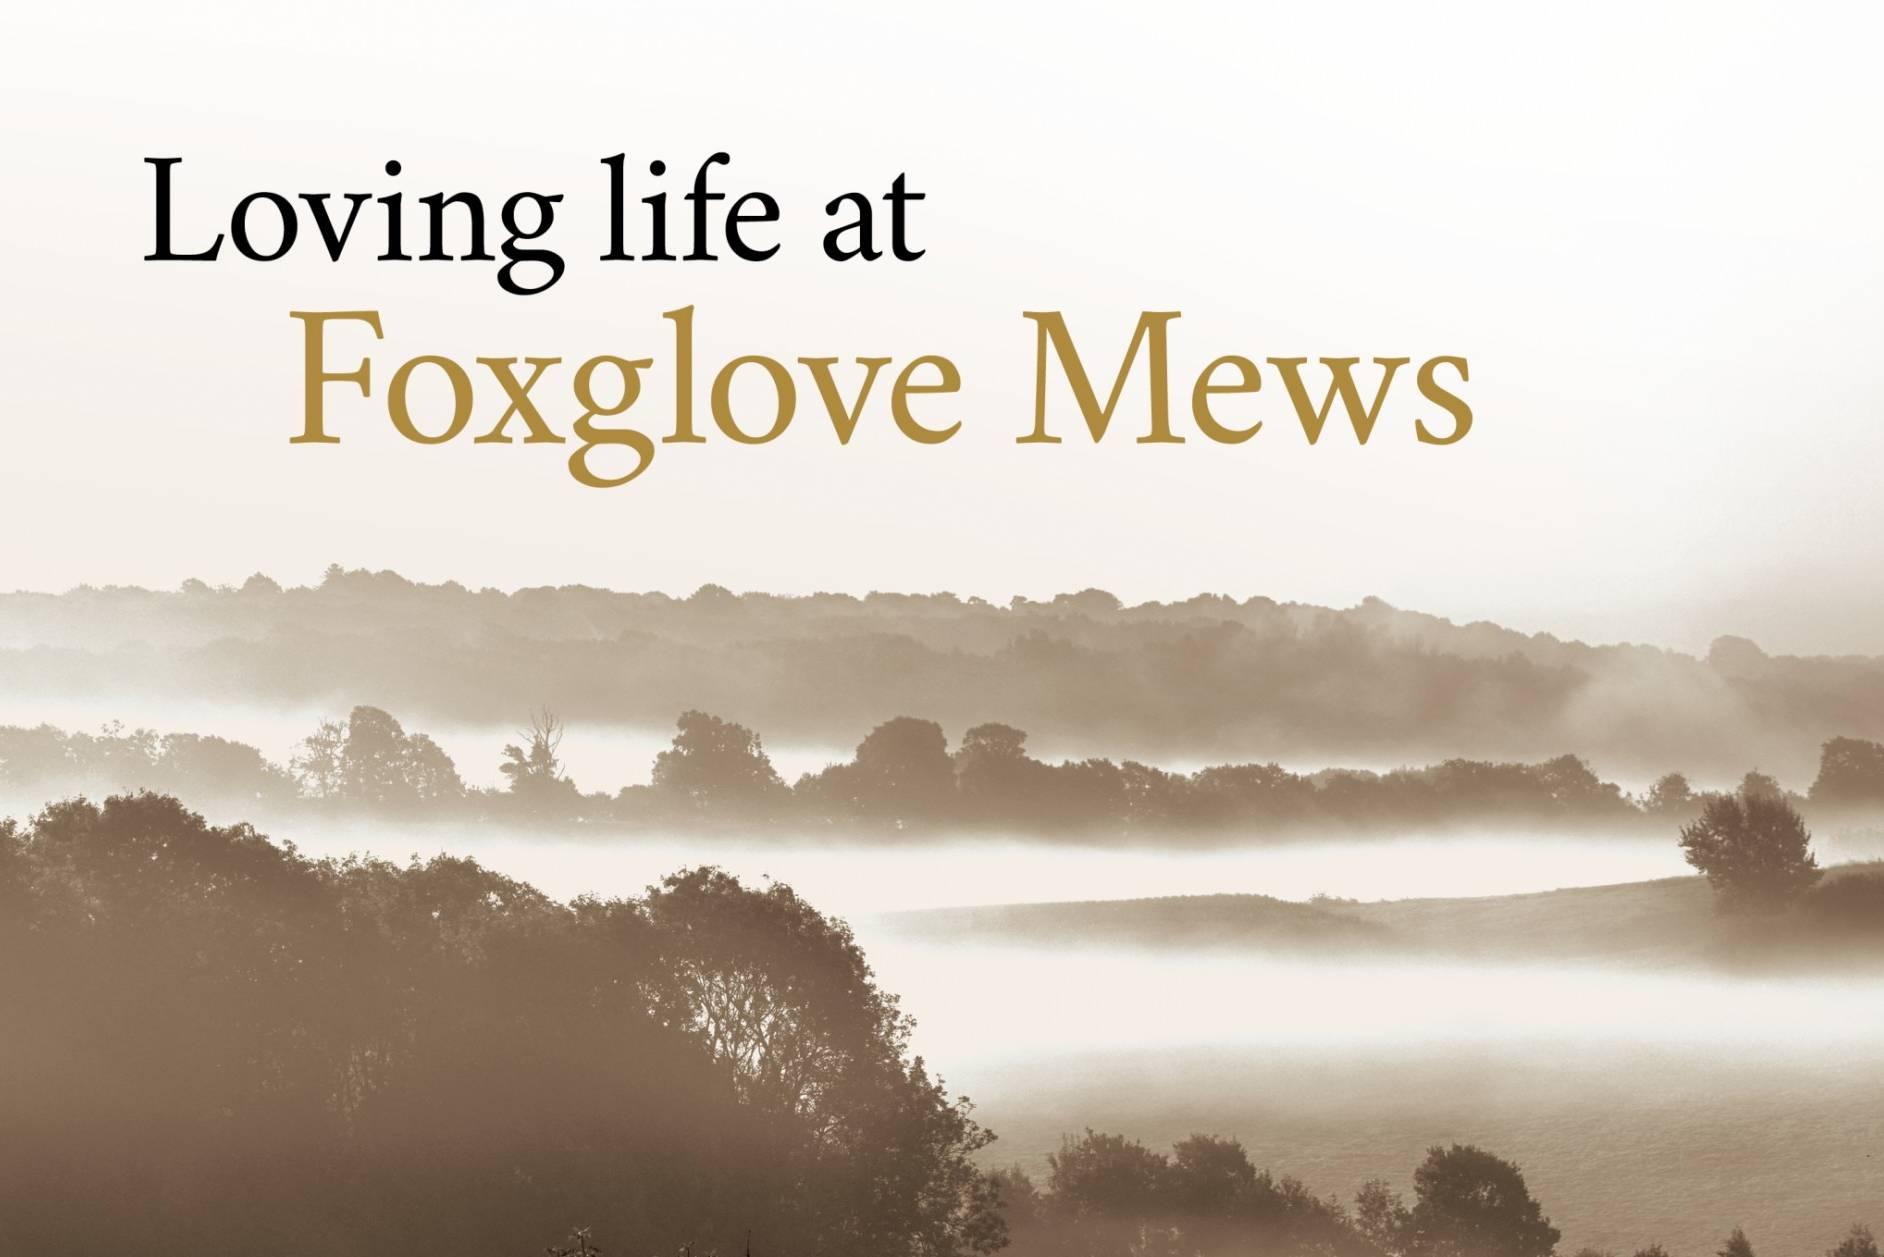 foxglove mews image 08